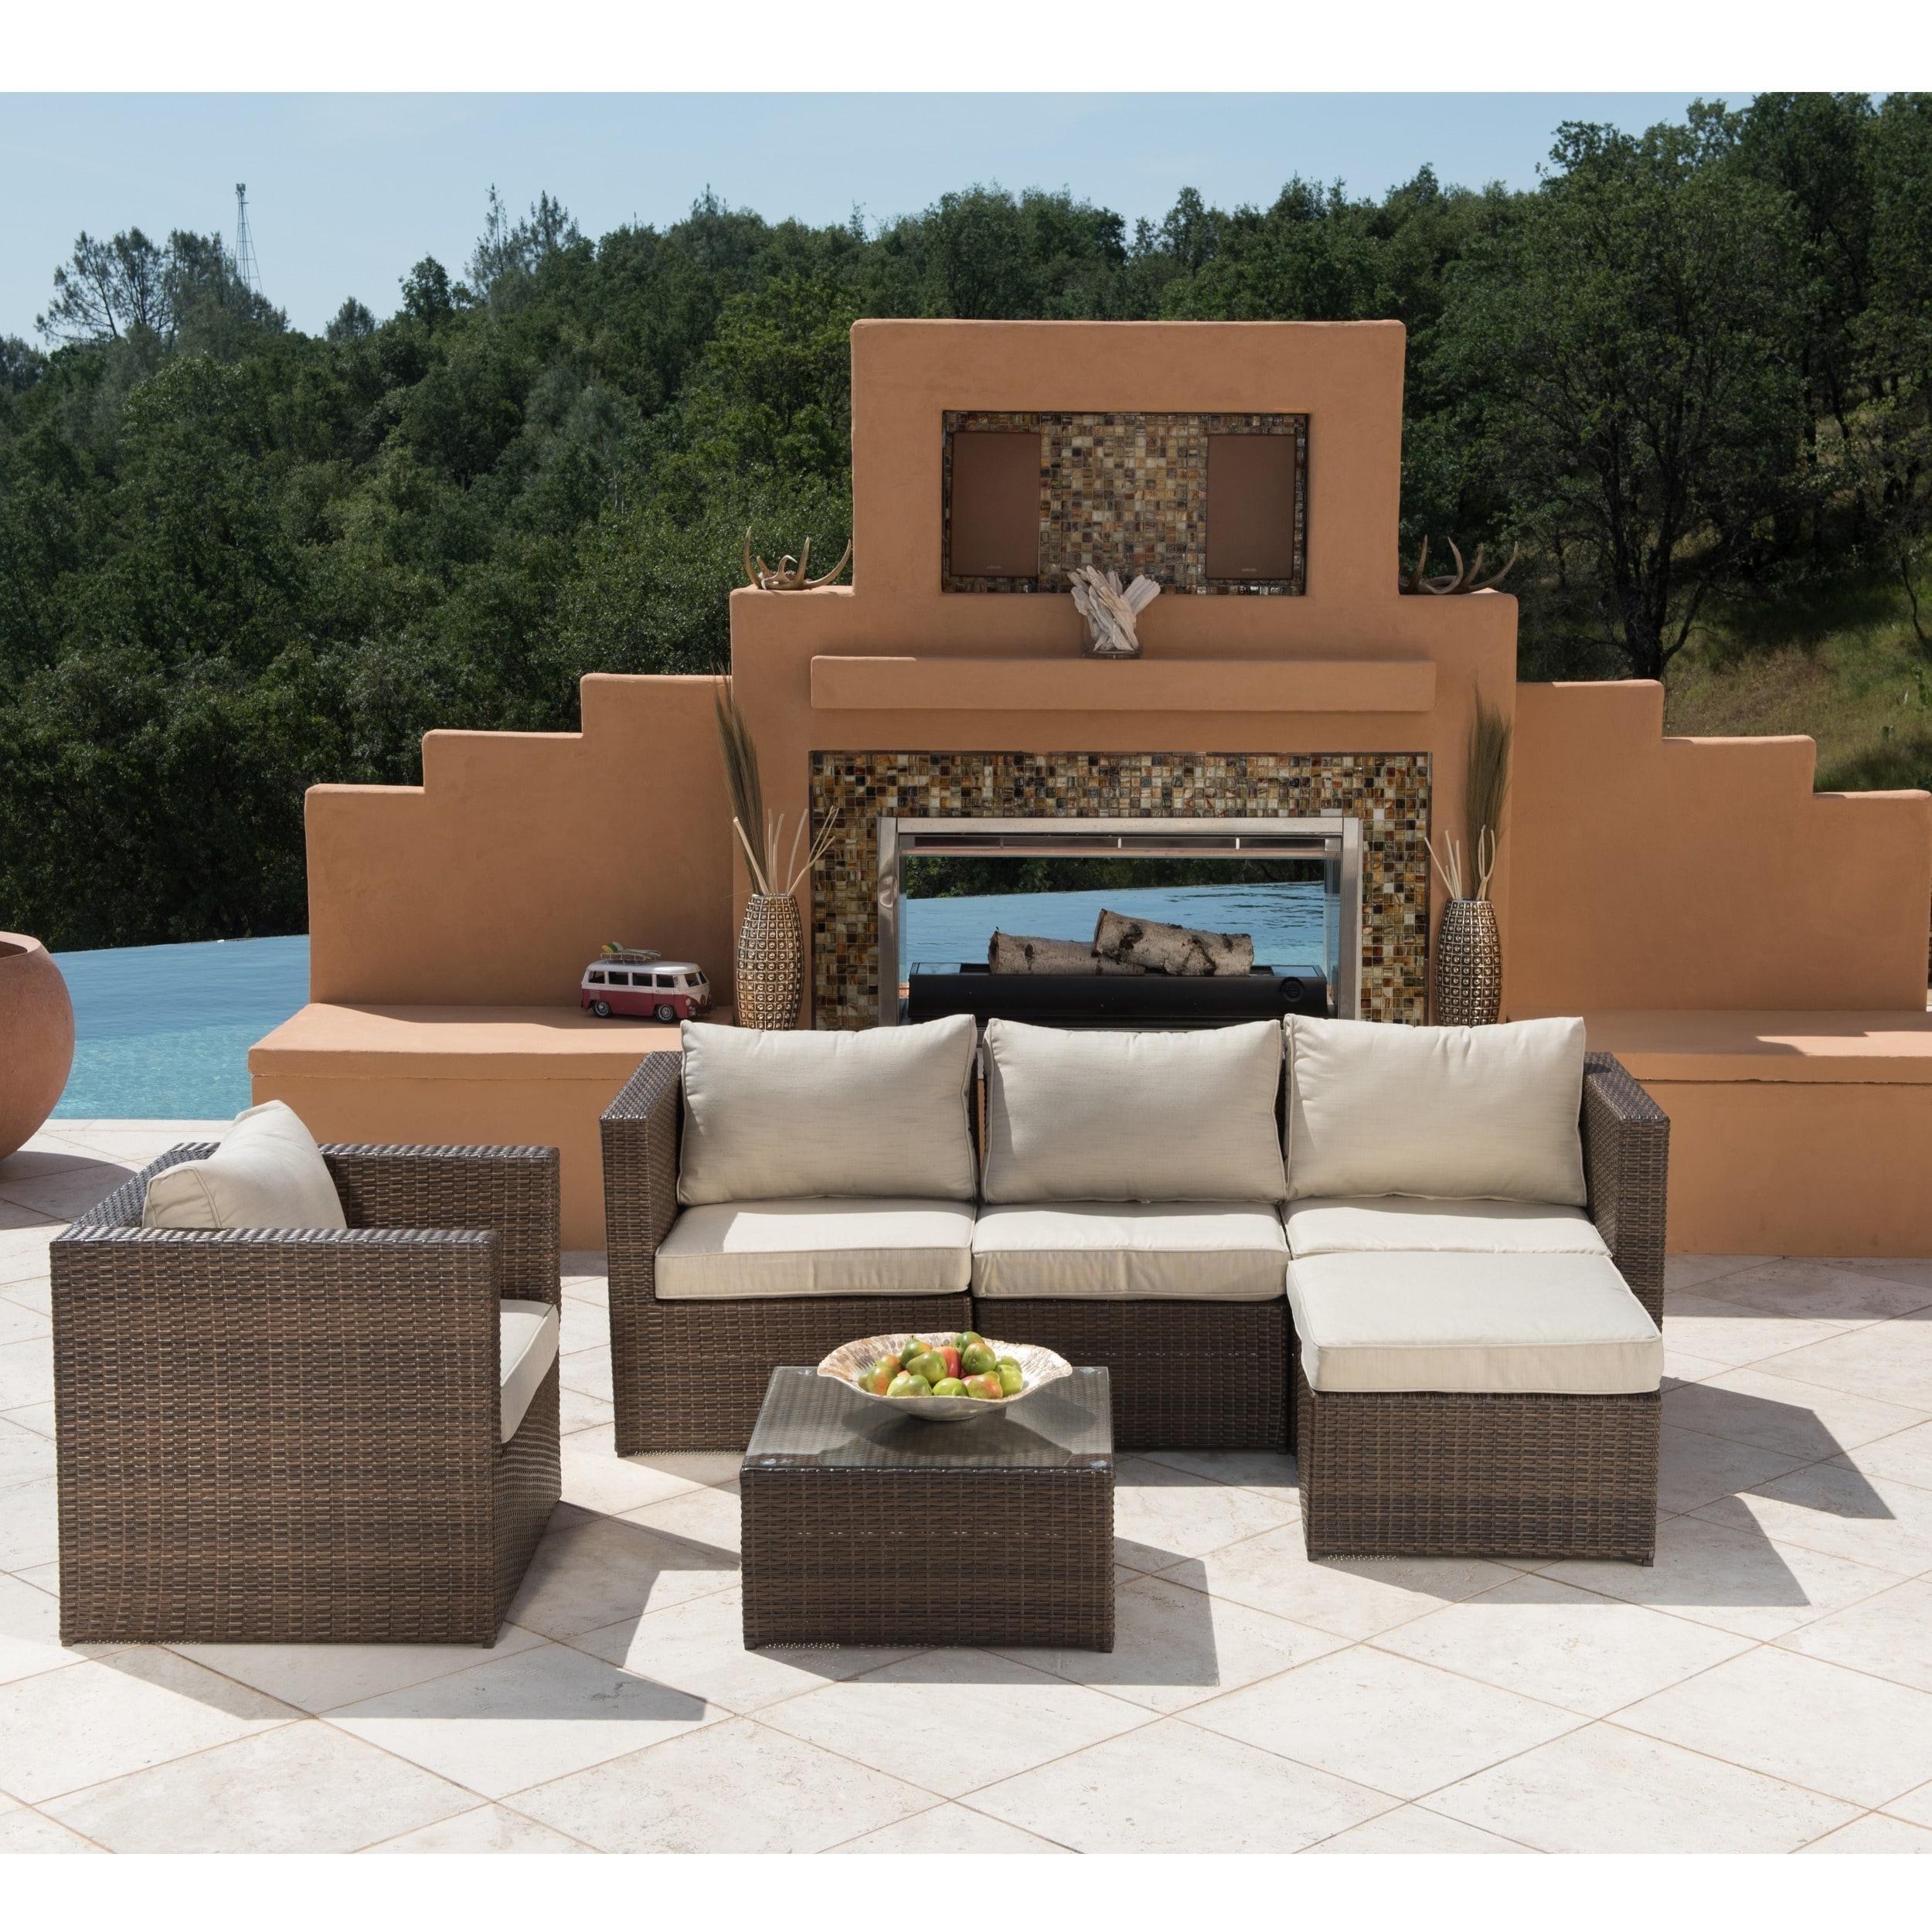 Corvus Trey 6 piece Brown Wicker Patio Furniture Set Free